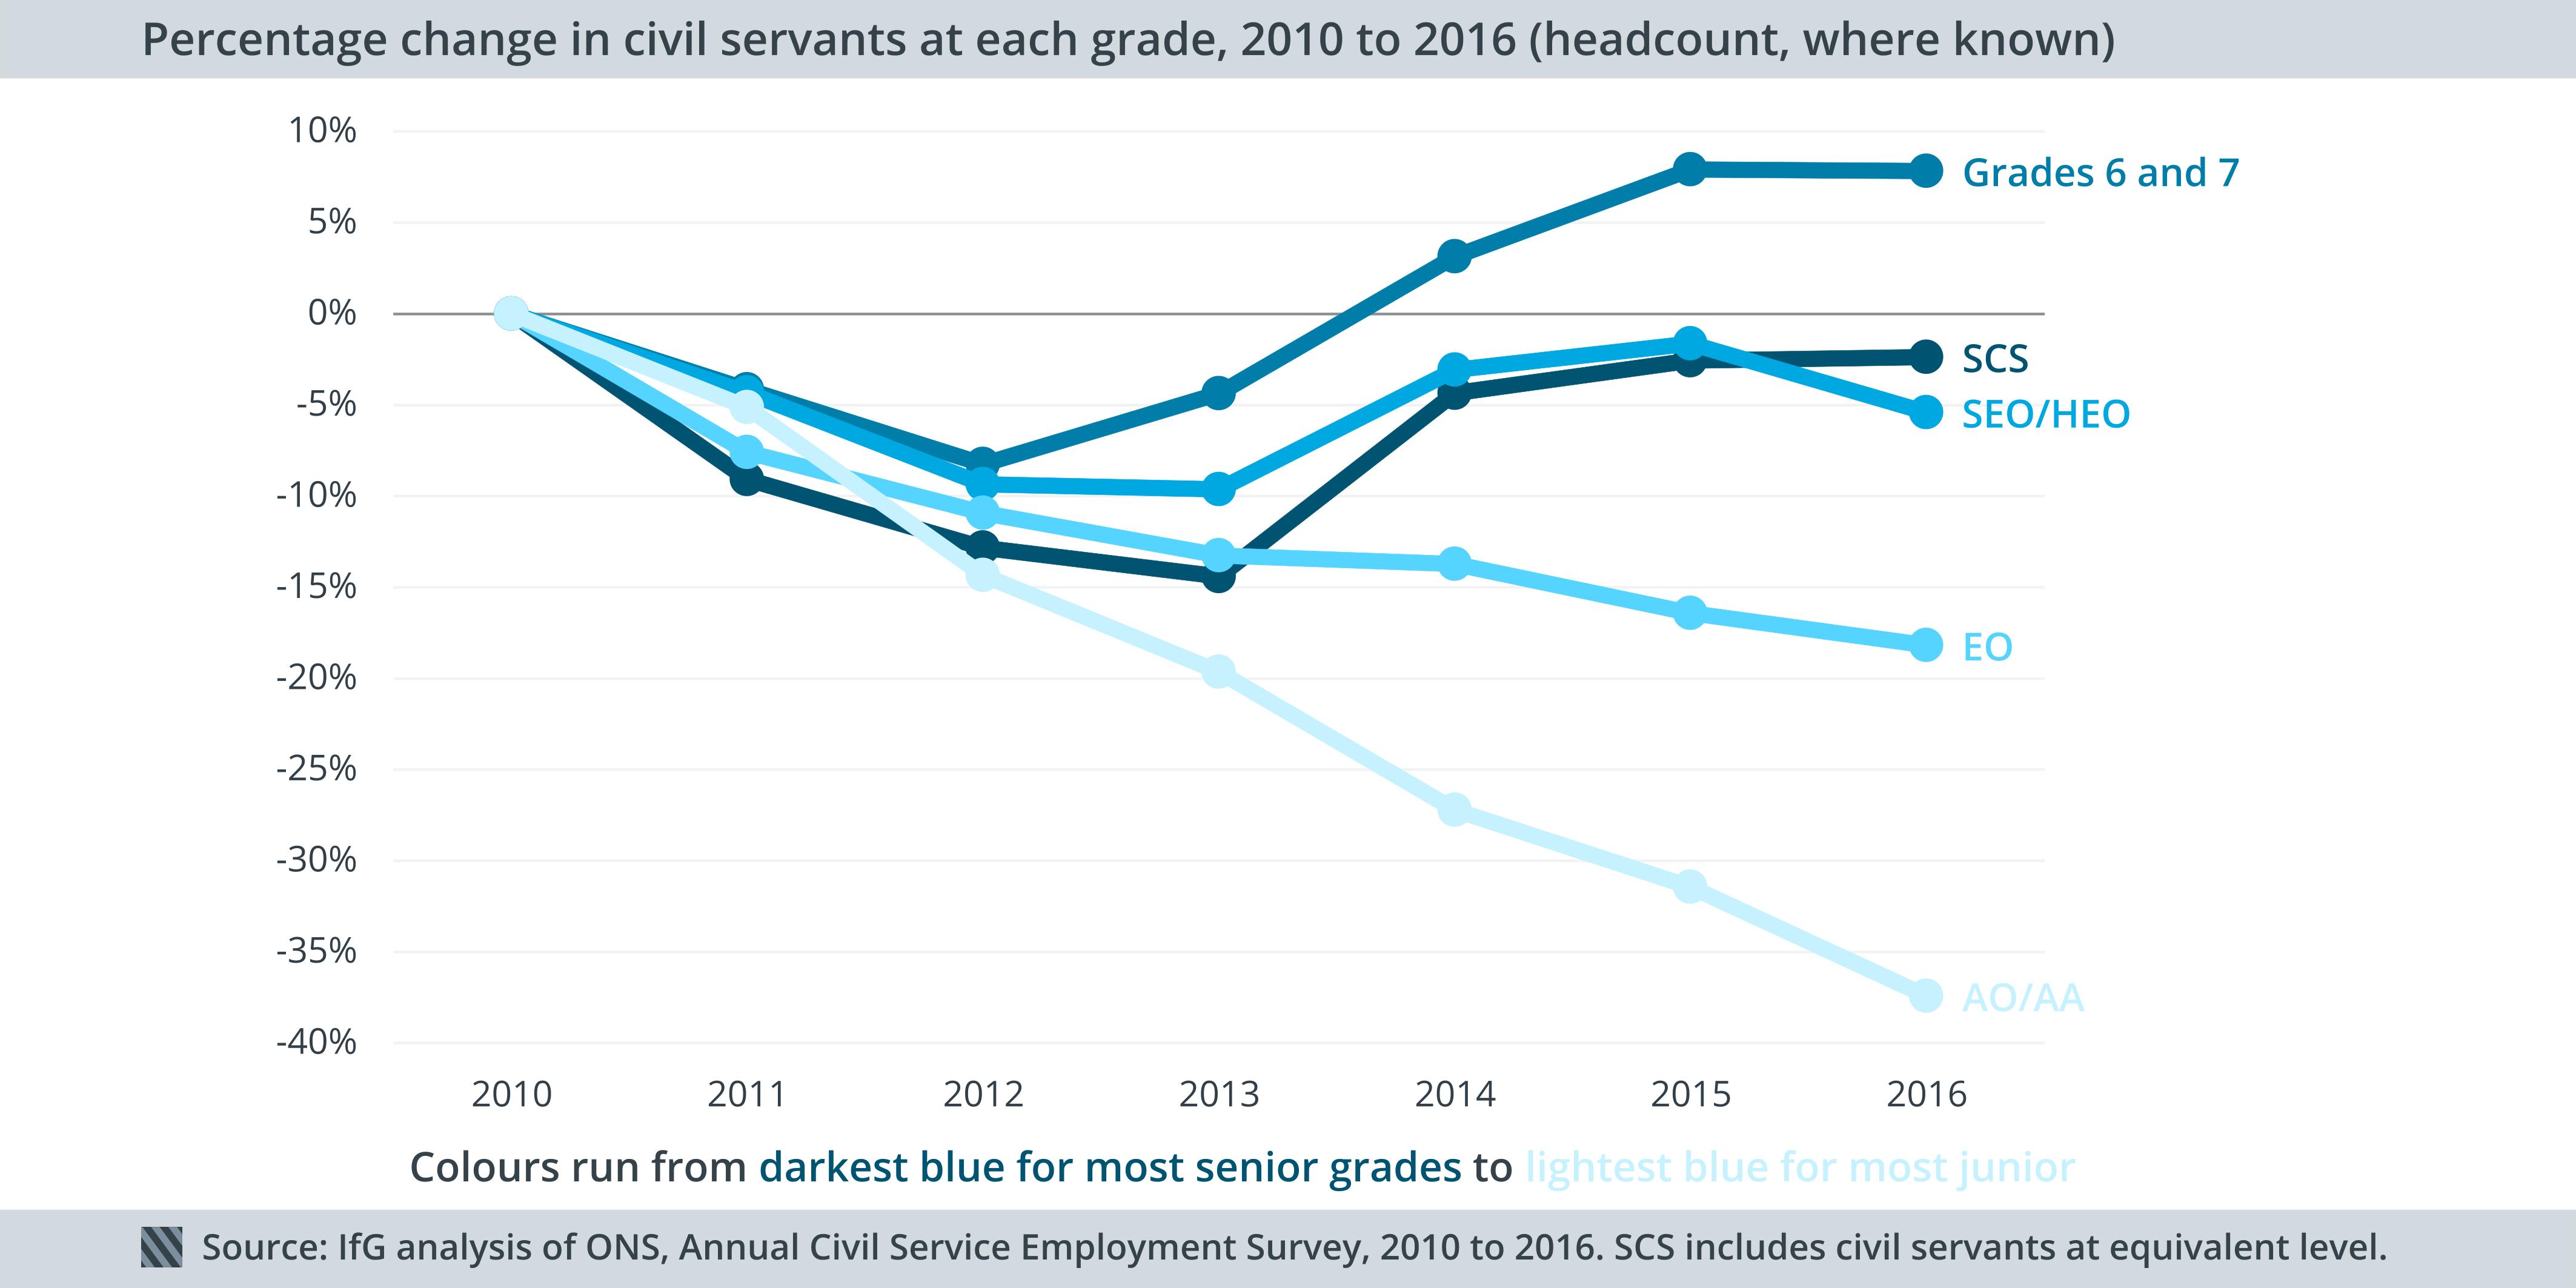 Grade reductions, 2010-16